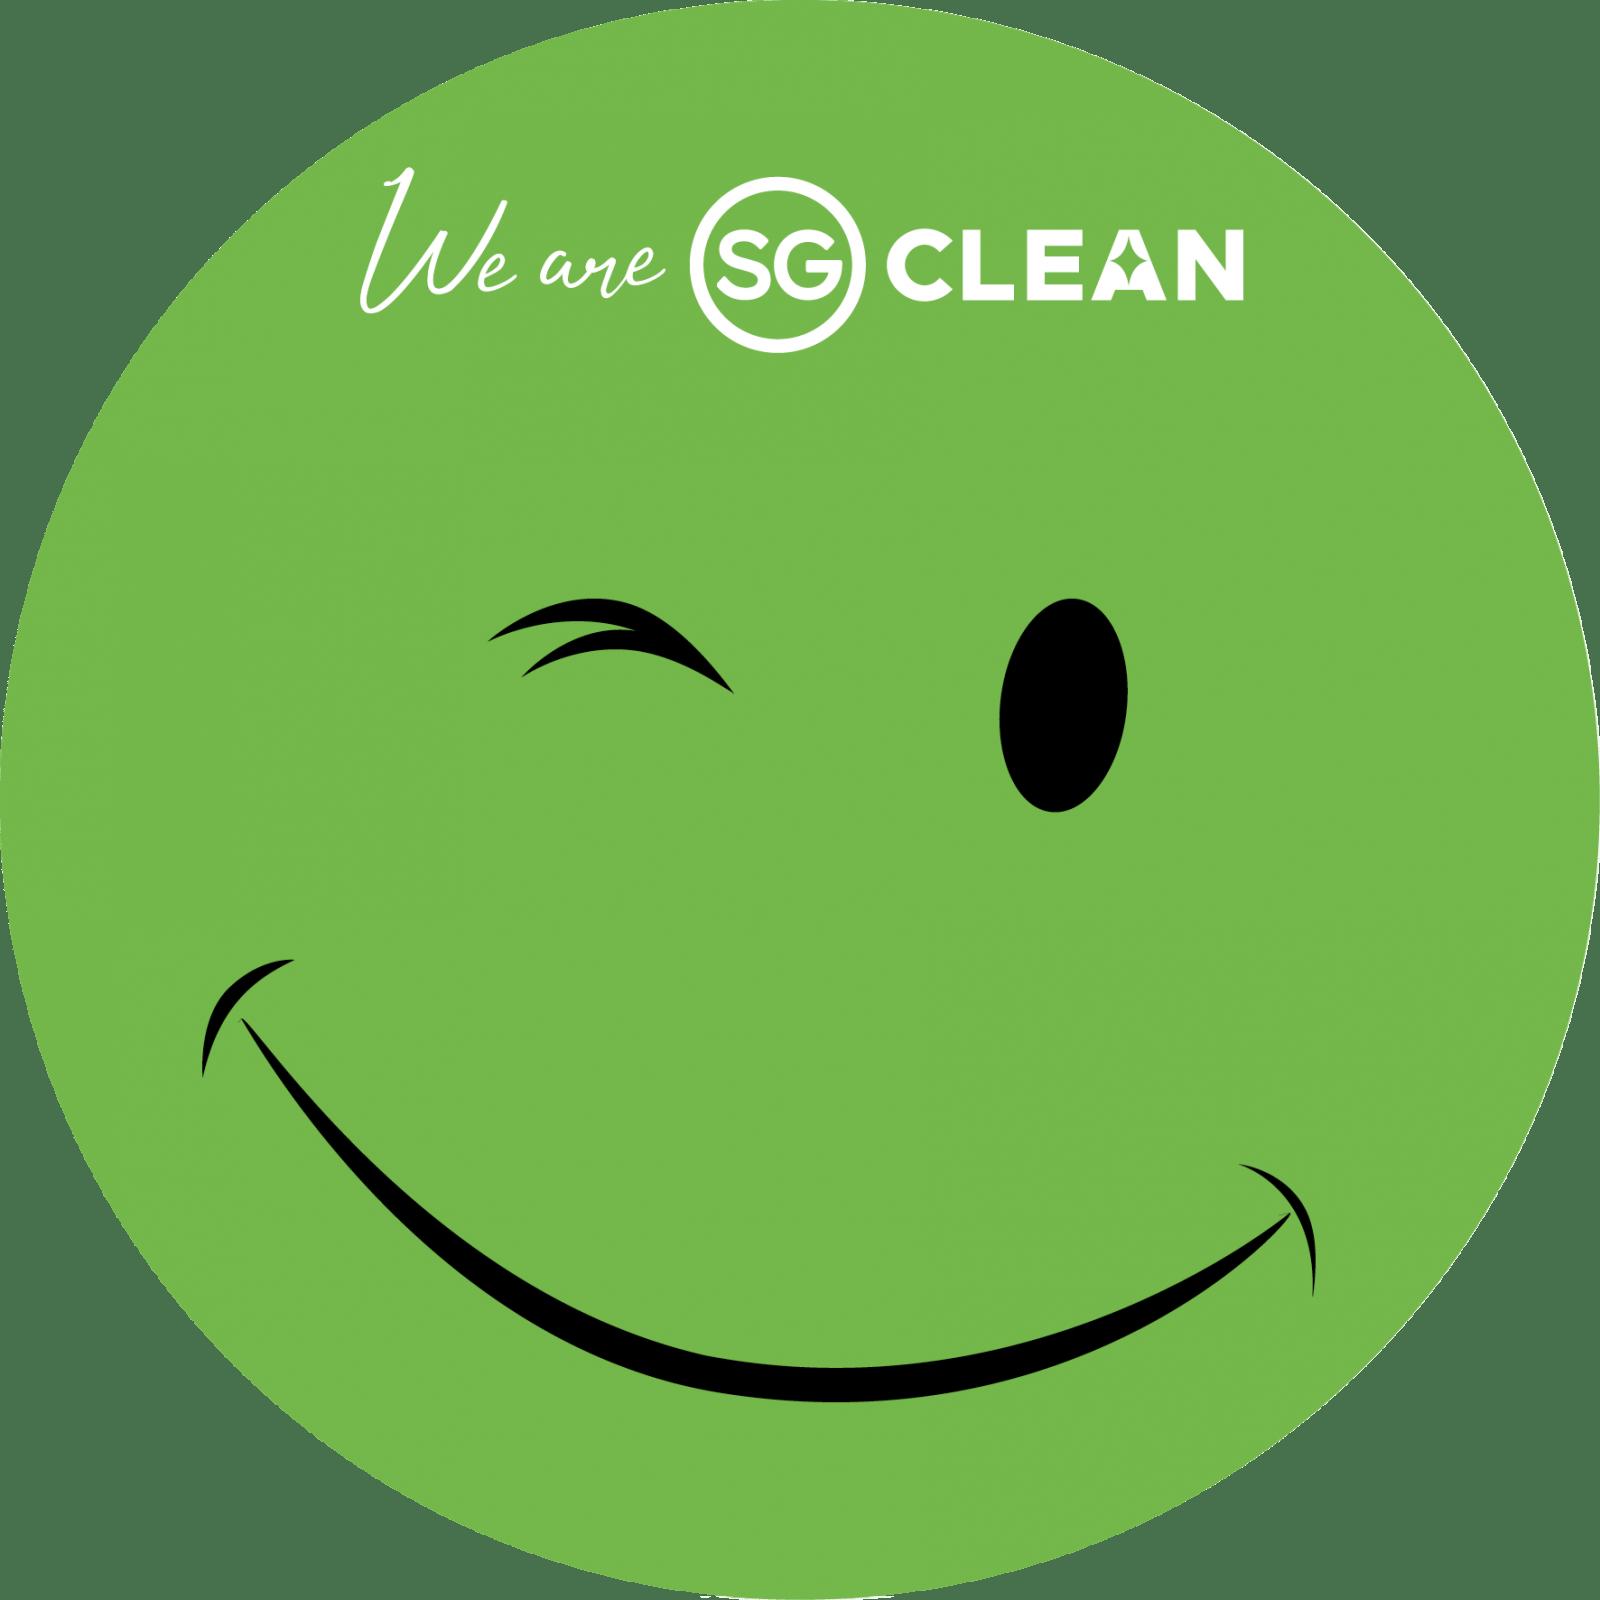 SG Clean Digital Sticker